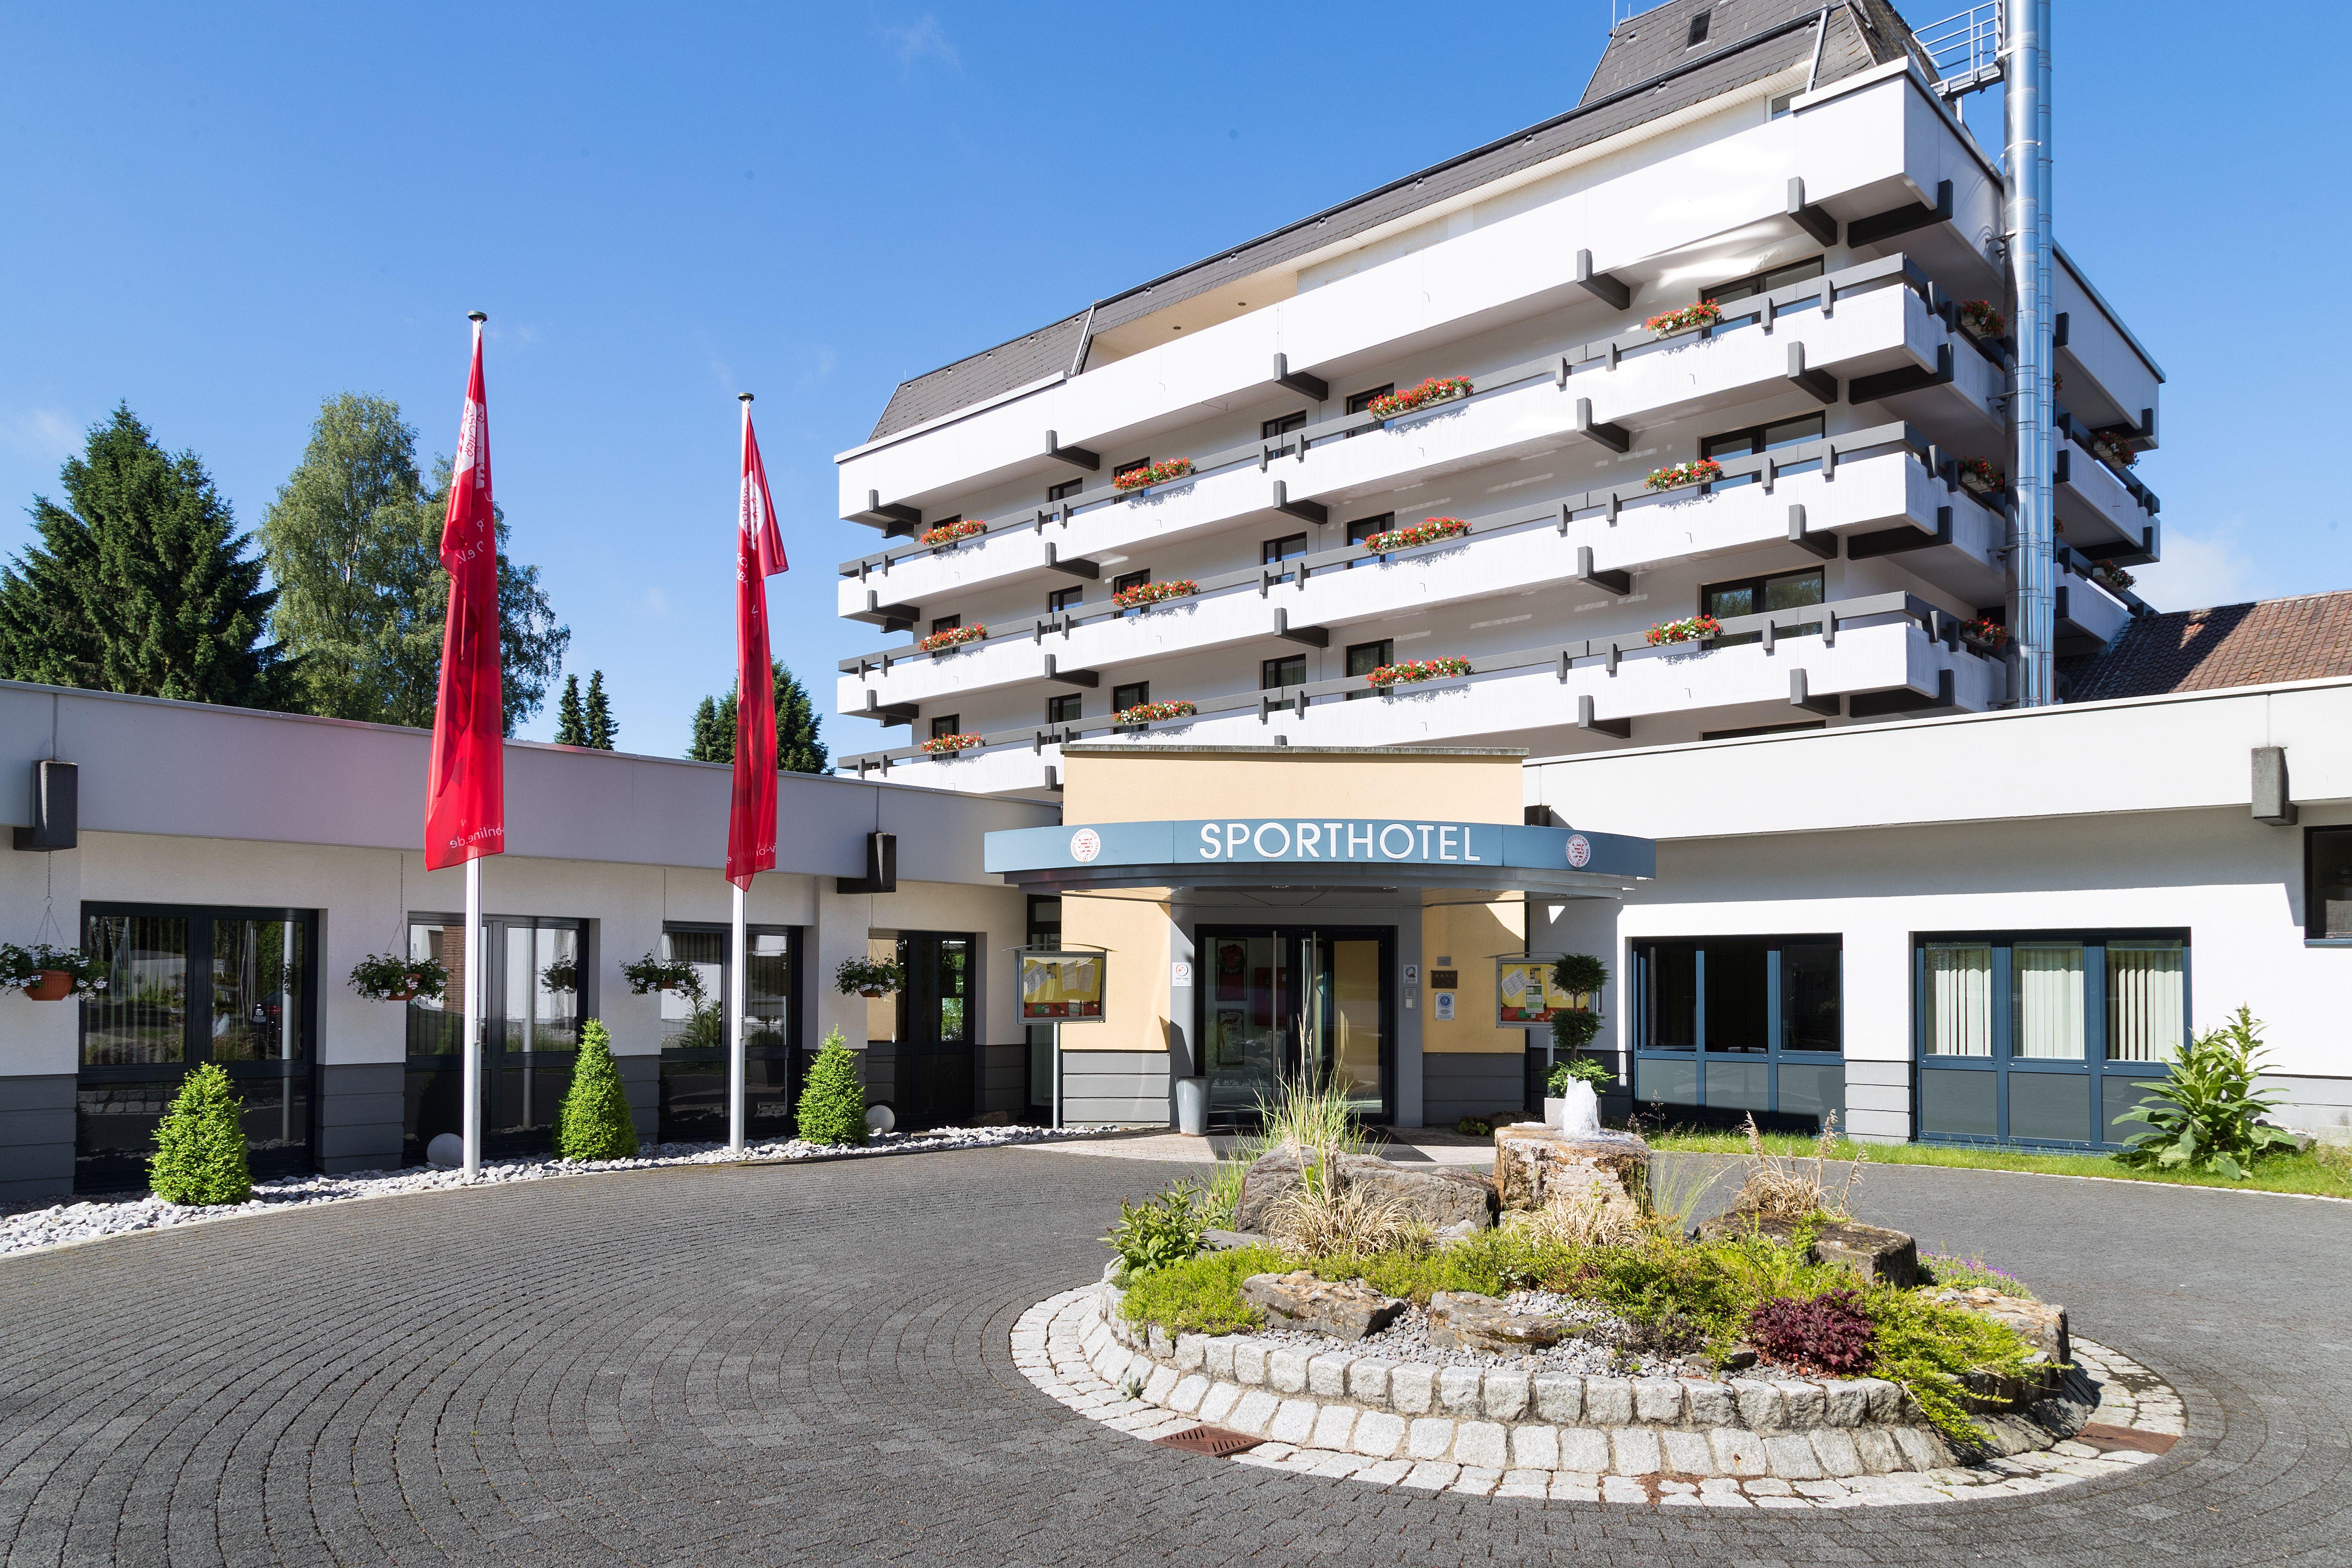 Sporthotel Grünberg-Sporthotel Grünberg